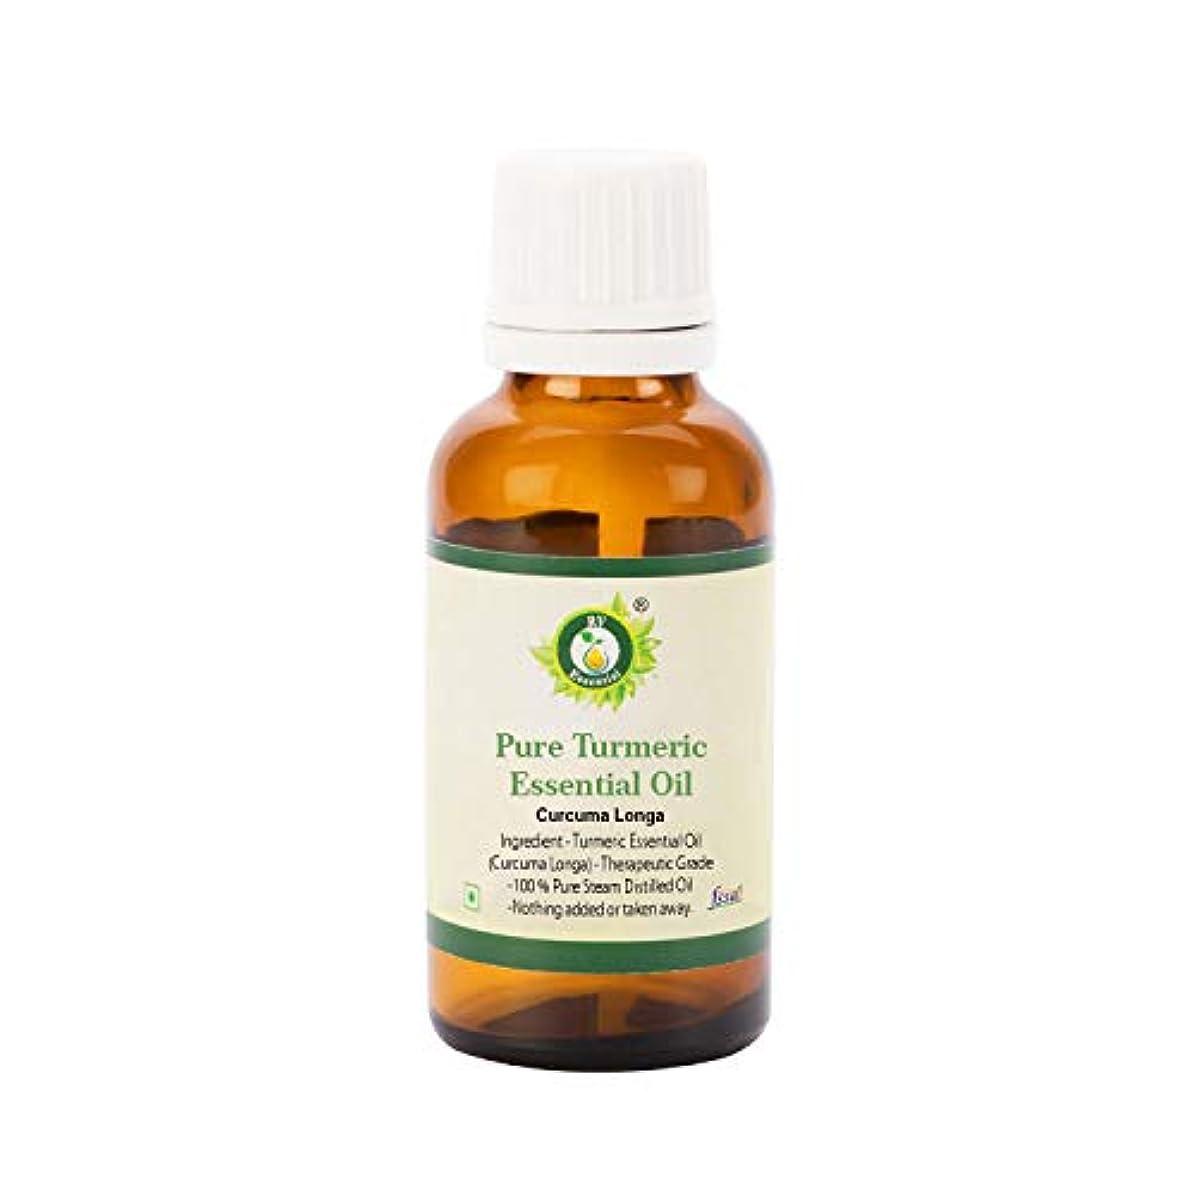 R V Essential 純粋なウコン精油5ml (0.169oz)- Curcuma Longa (100%純粋&天然スチームDistilled) Pure Turmeric Essential Oil